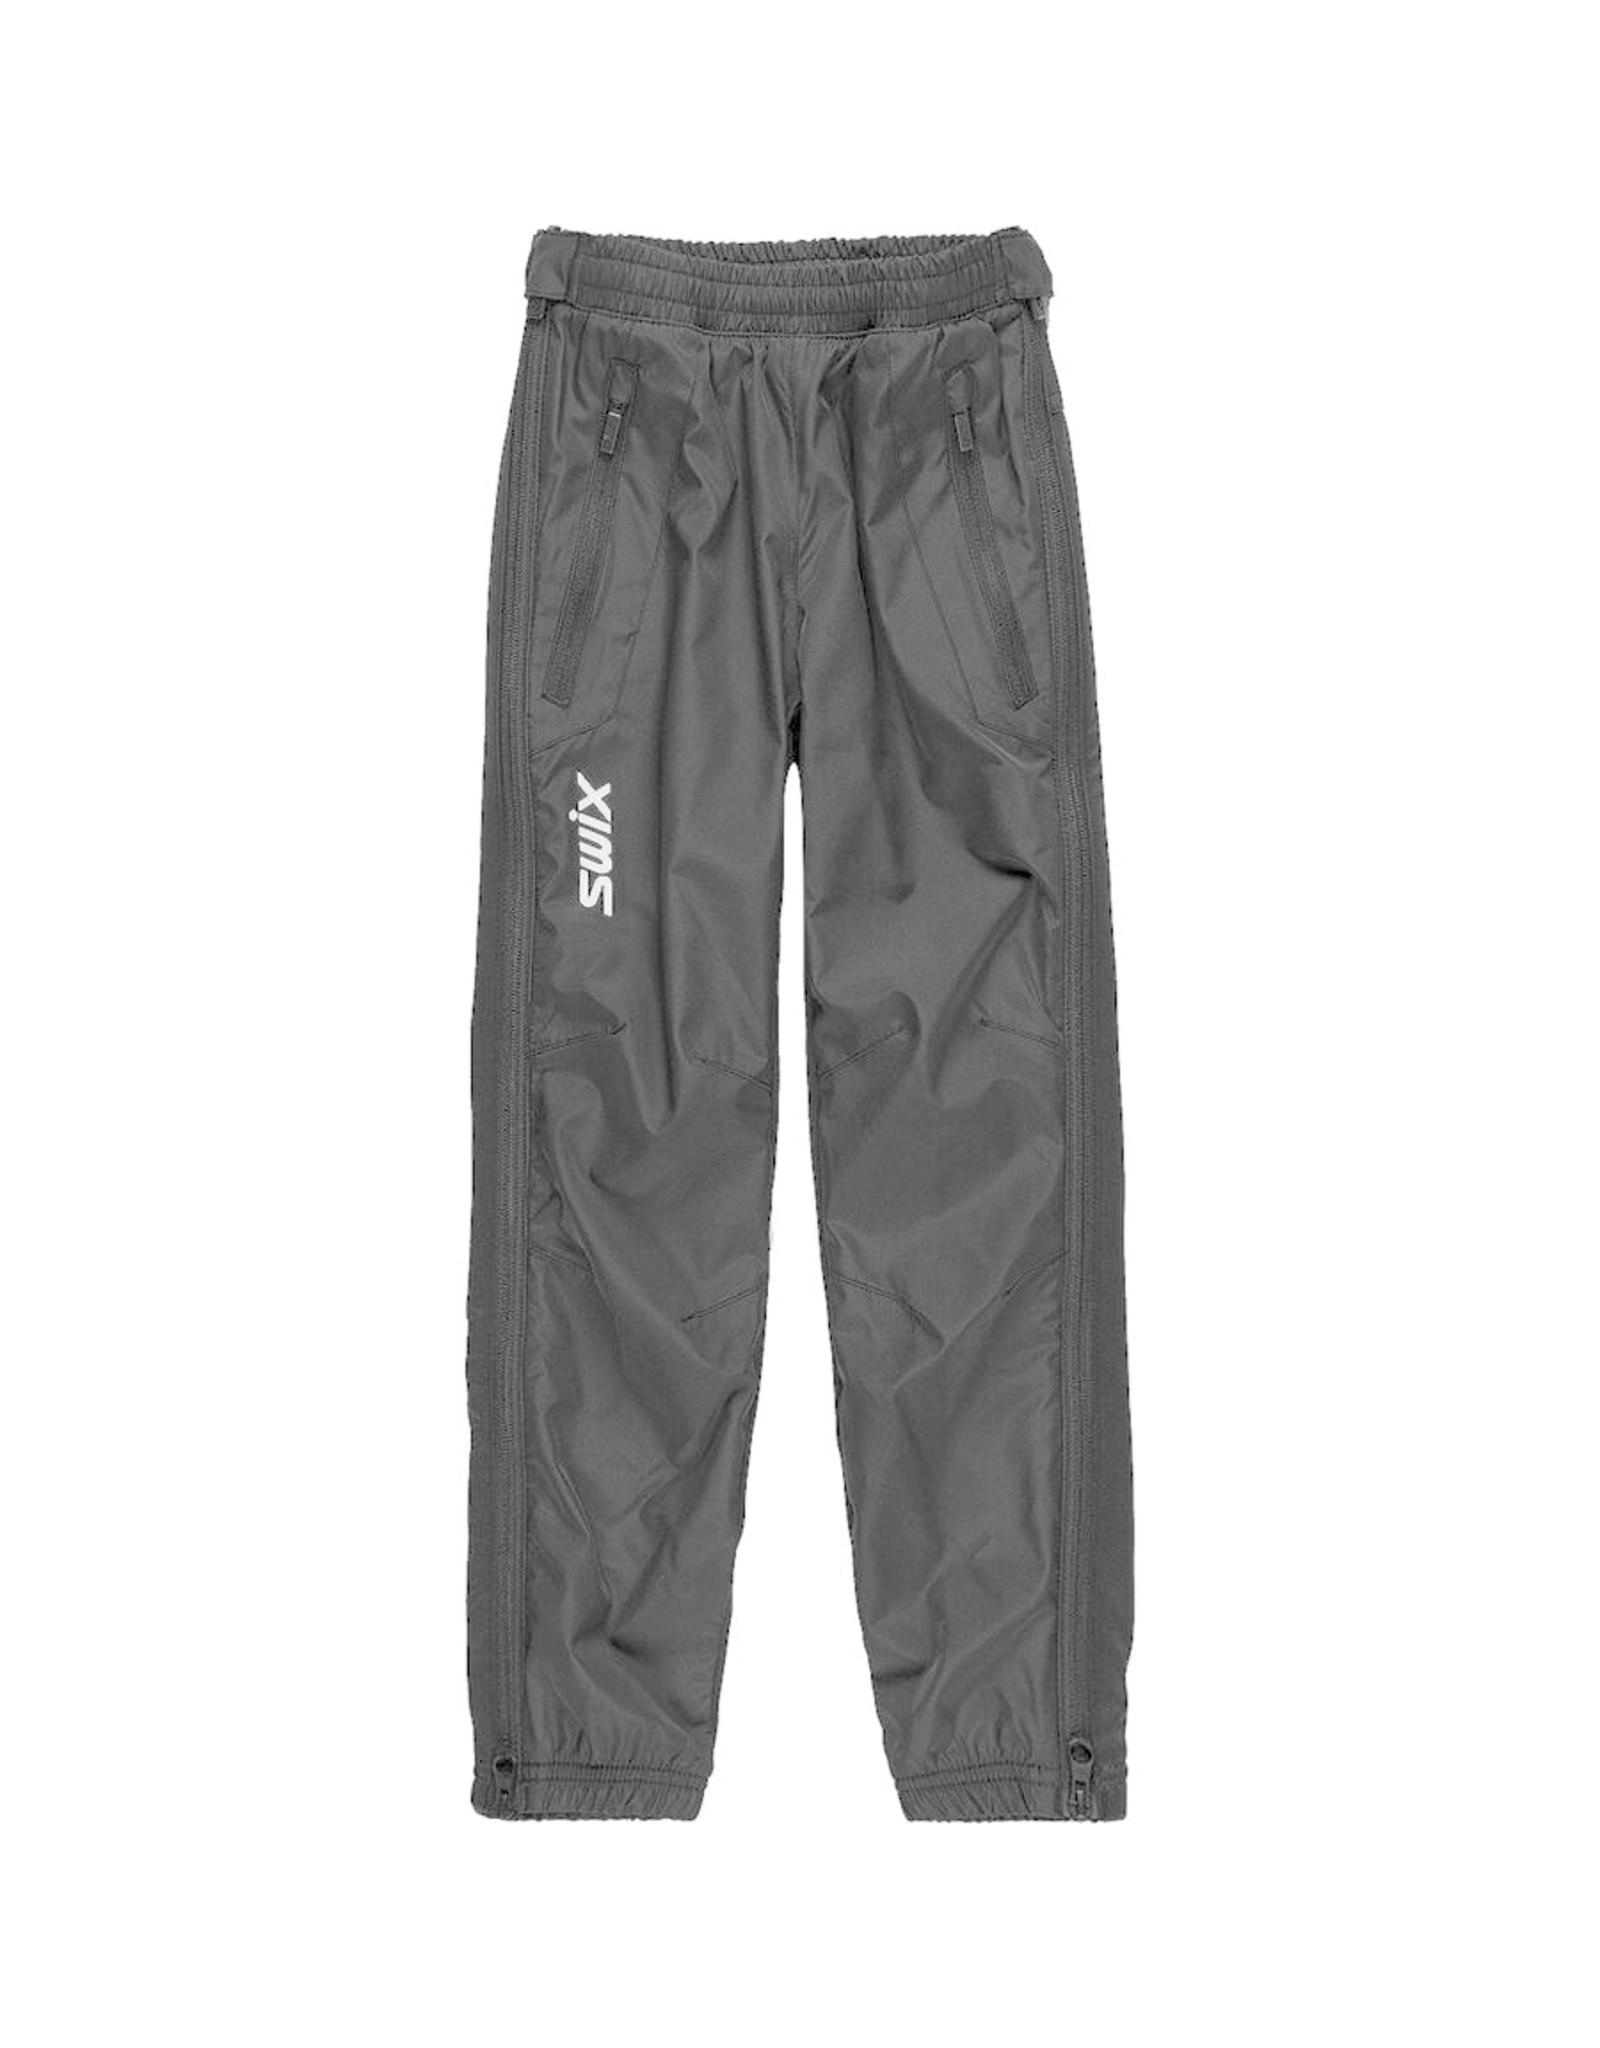 Swix UniversalX pants Juniors 164/14Yrs (10000) Black